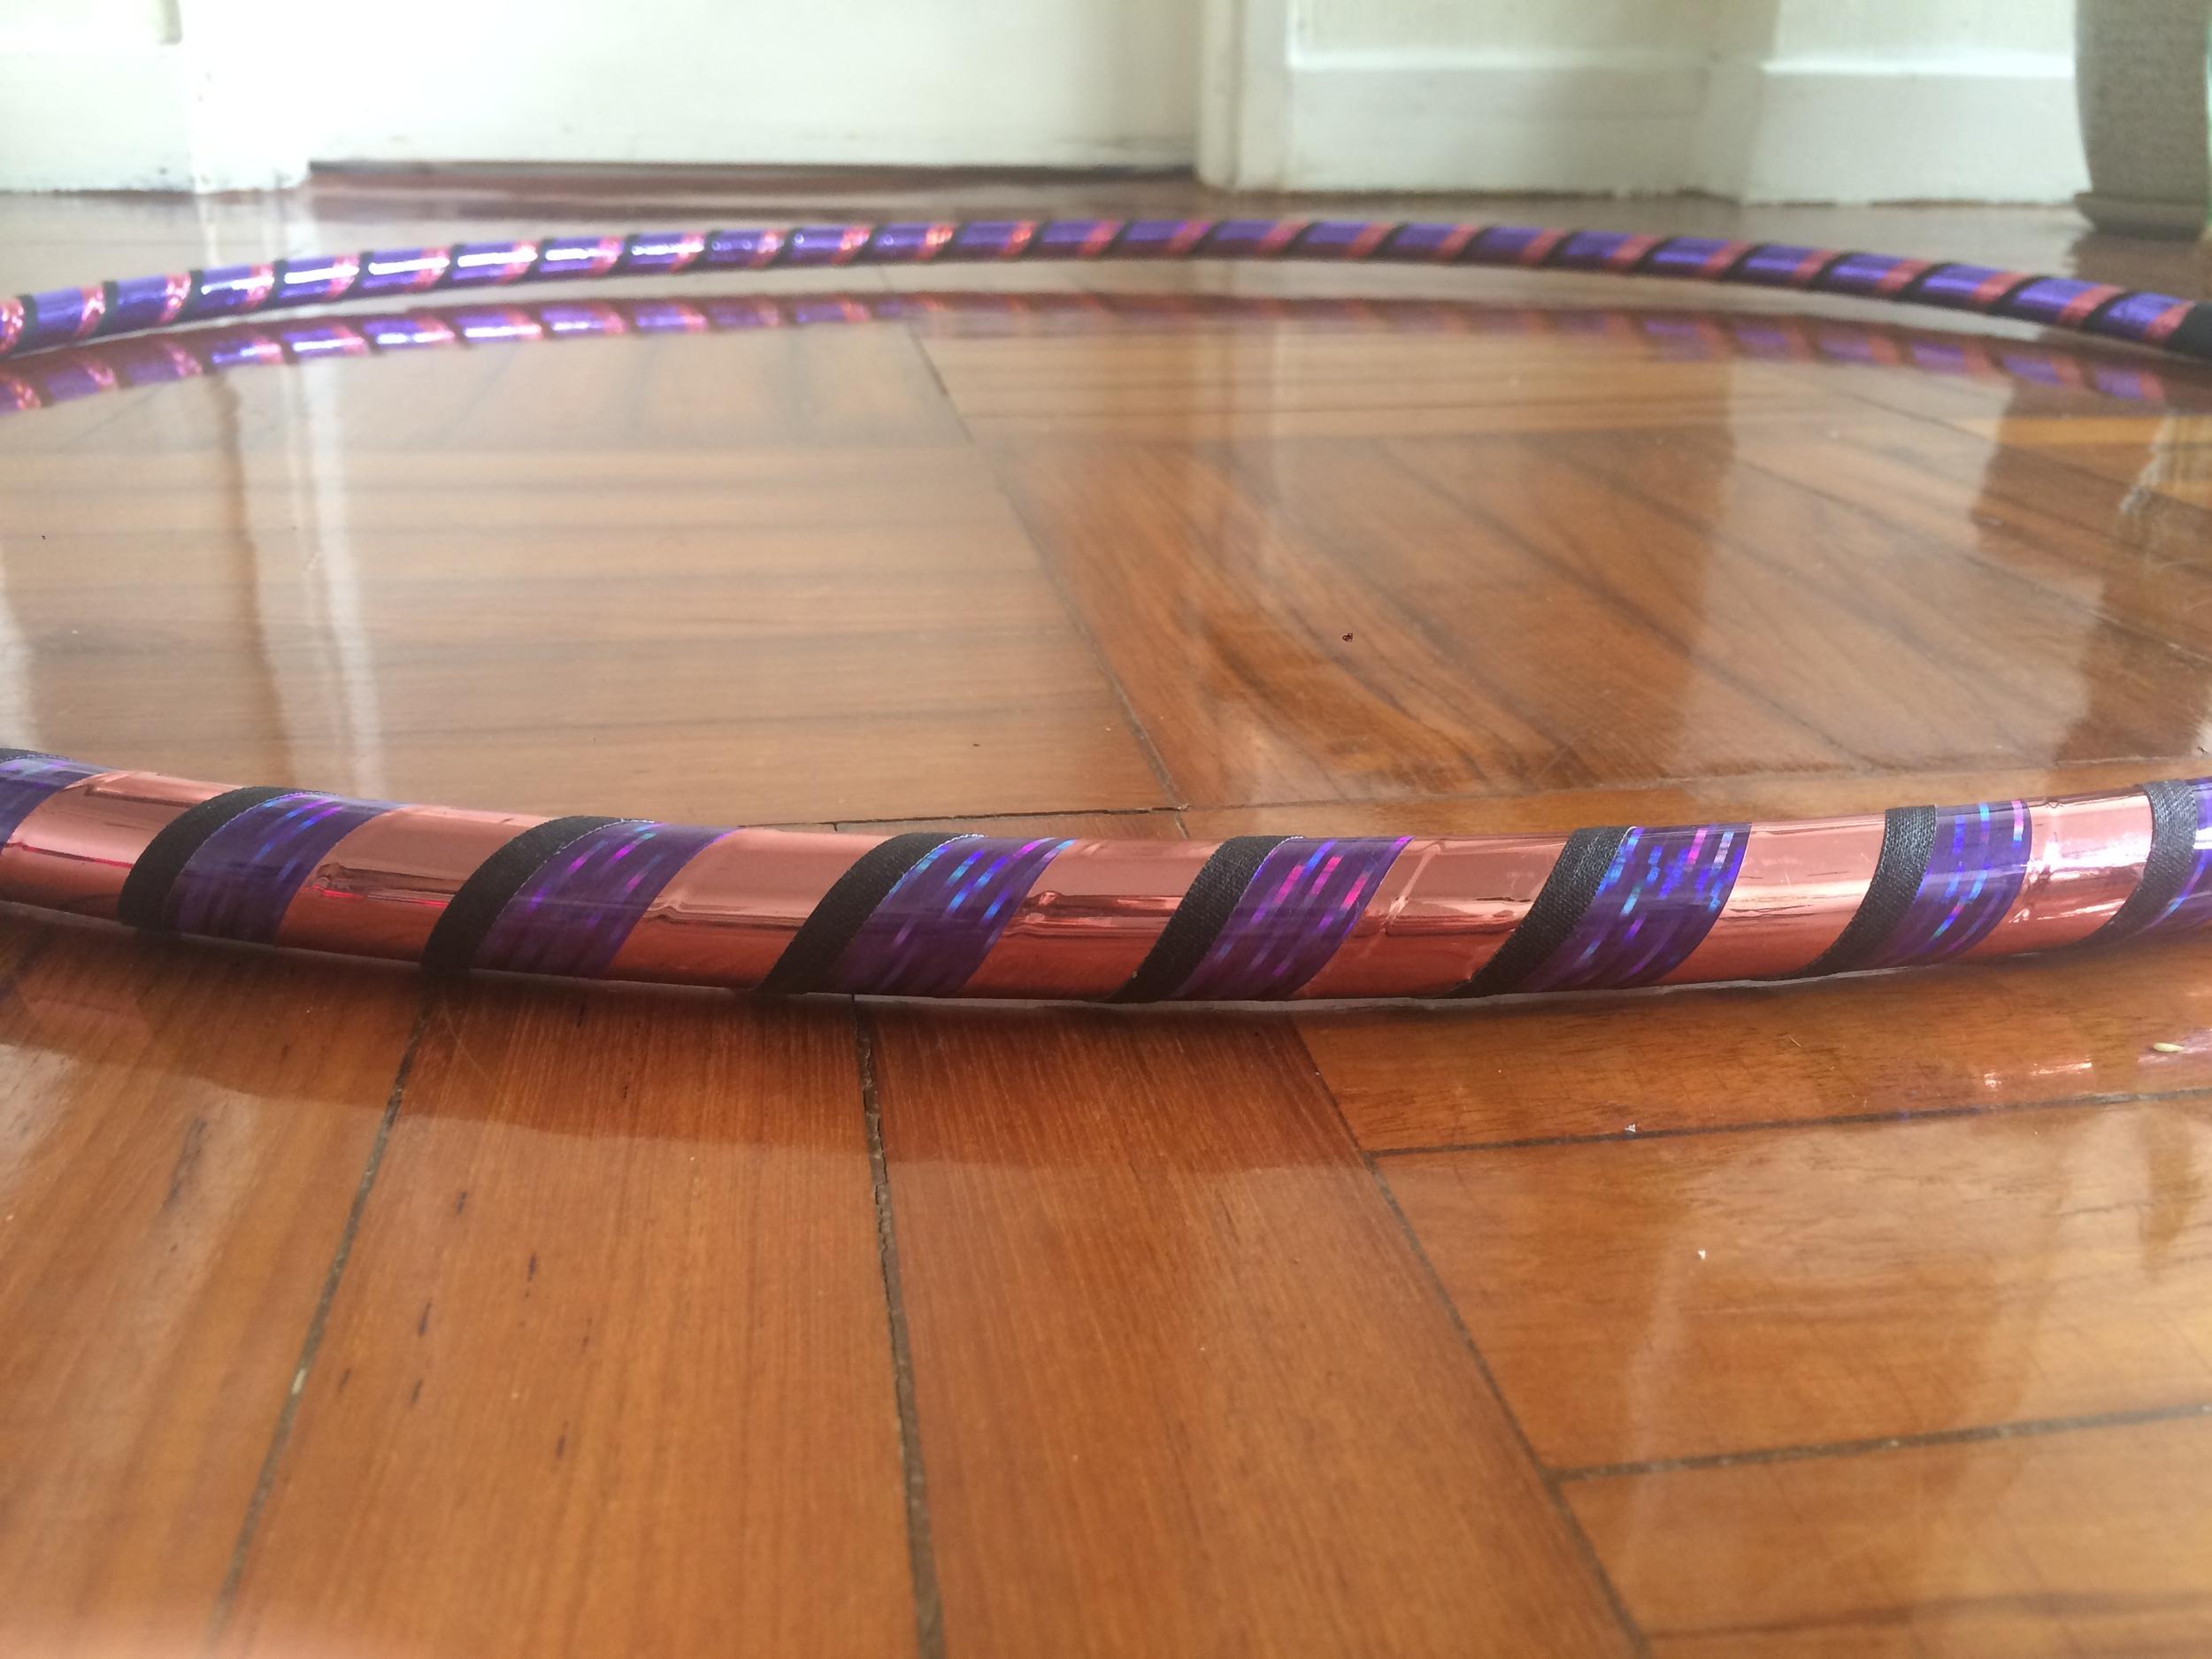 hula hoop for sale hong kong